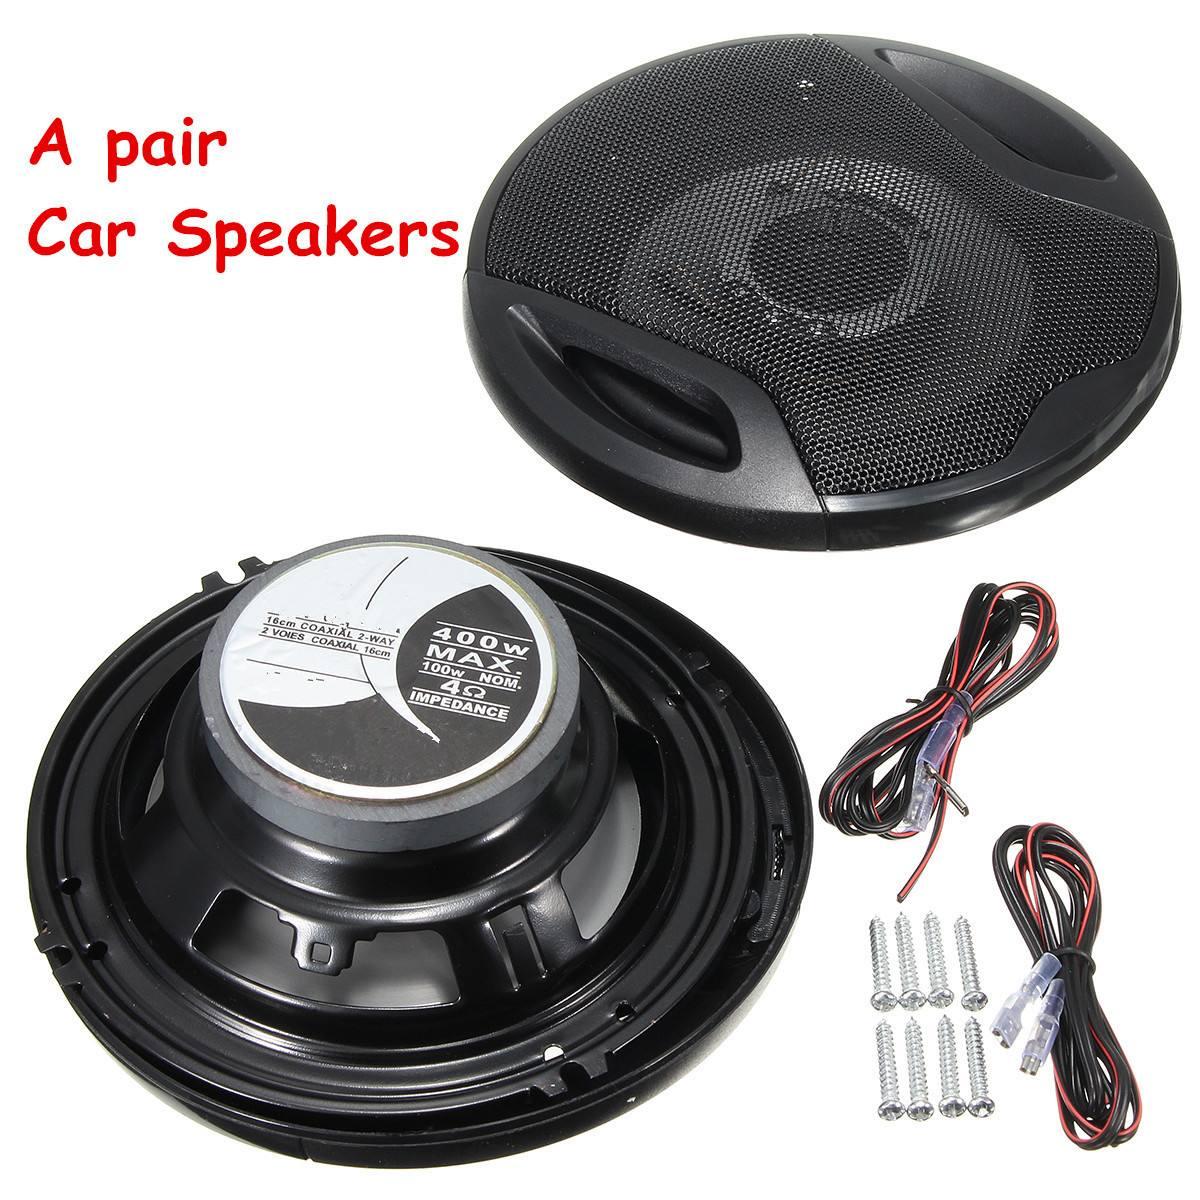 "KROAK 1Pair Car Speaker 12V 400W 6"" Car Subwoofer Coaxial Speaker Car Rear/Front Door Audio Music Stereo 2 Way Coxial Speakers"